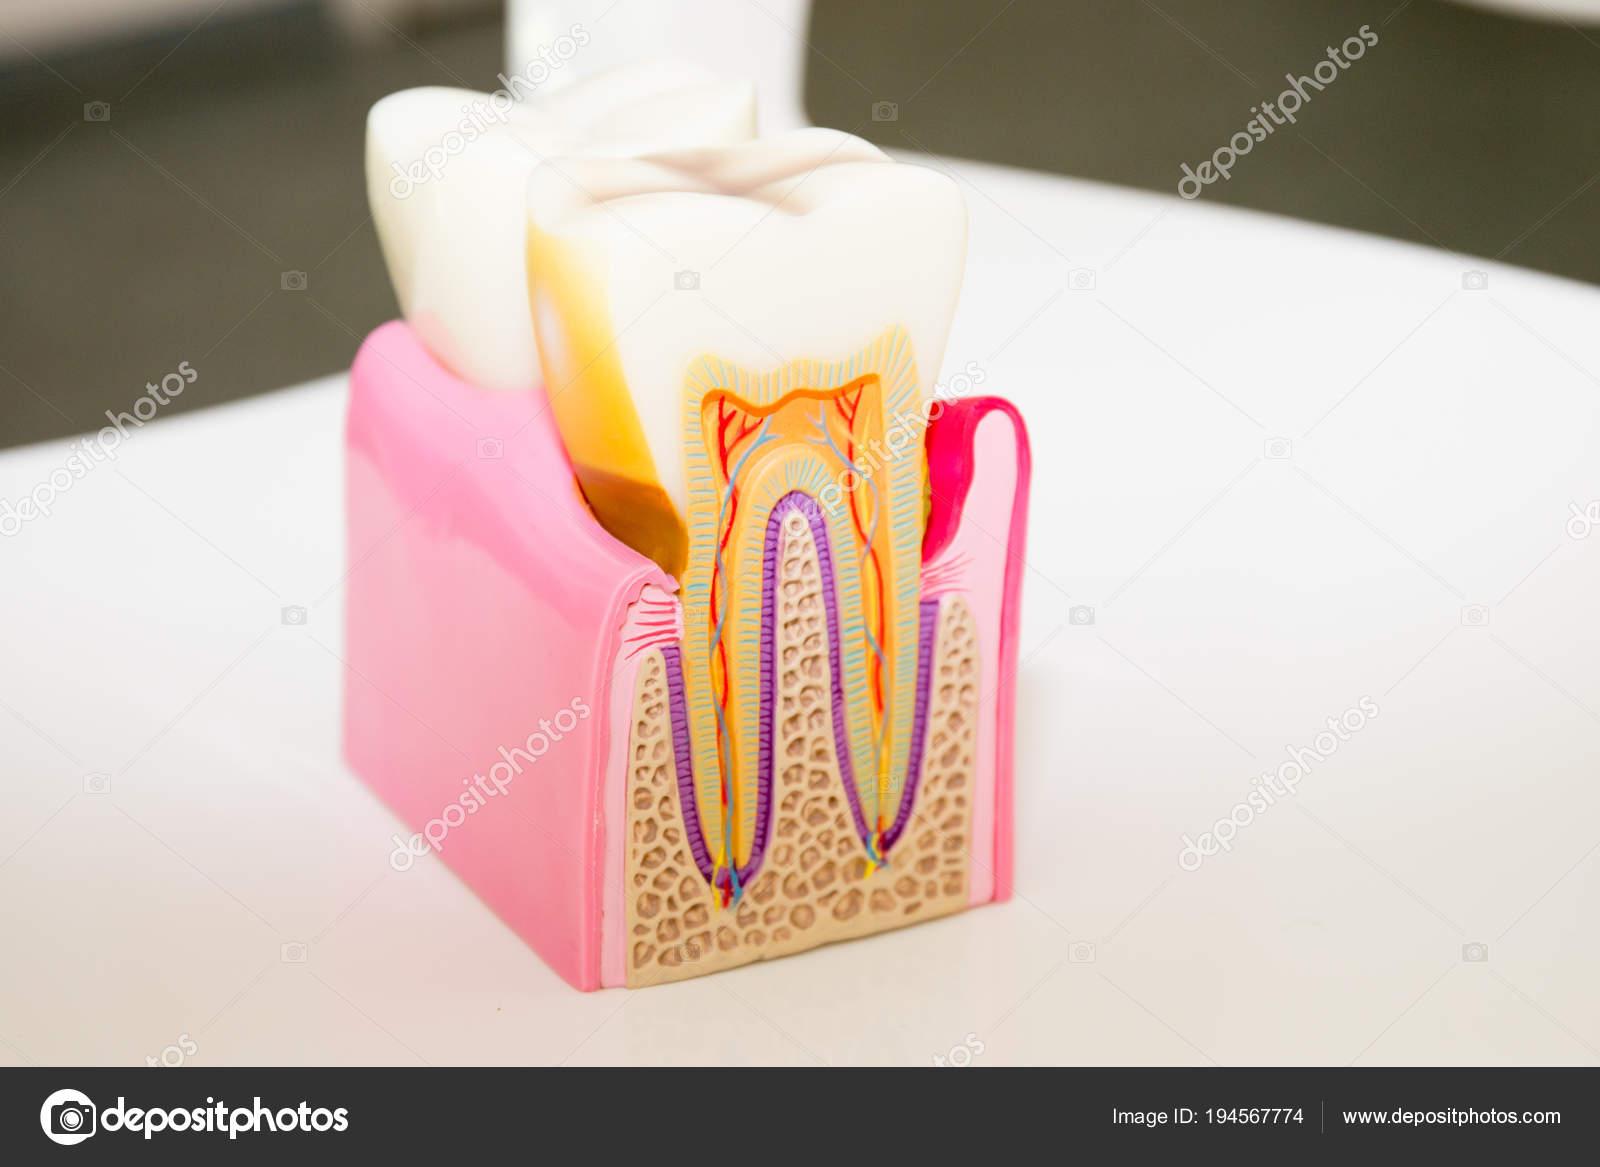 Anatomía Dental Modelo Concepto Dentista Diente Corte Transversal ...